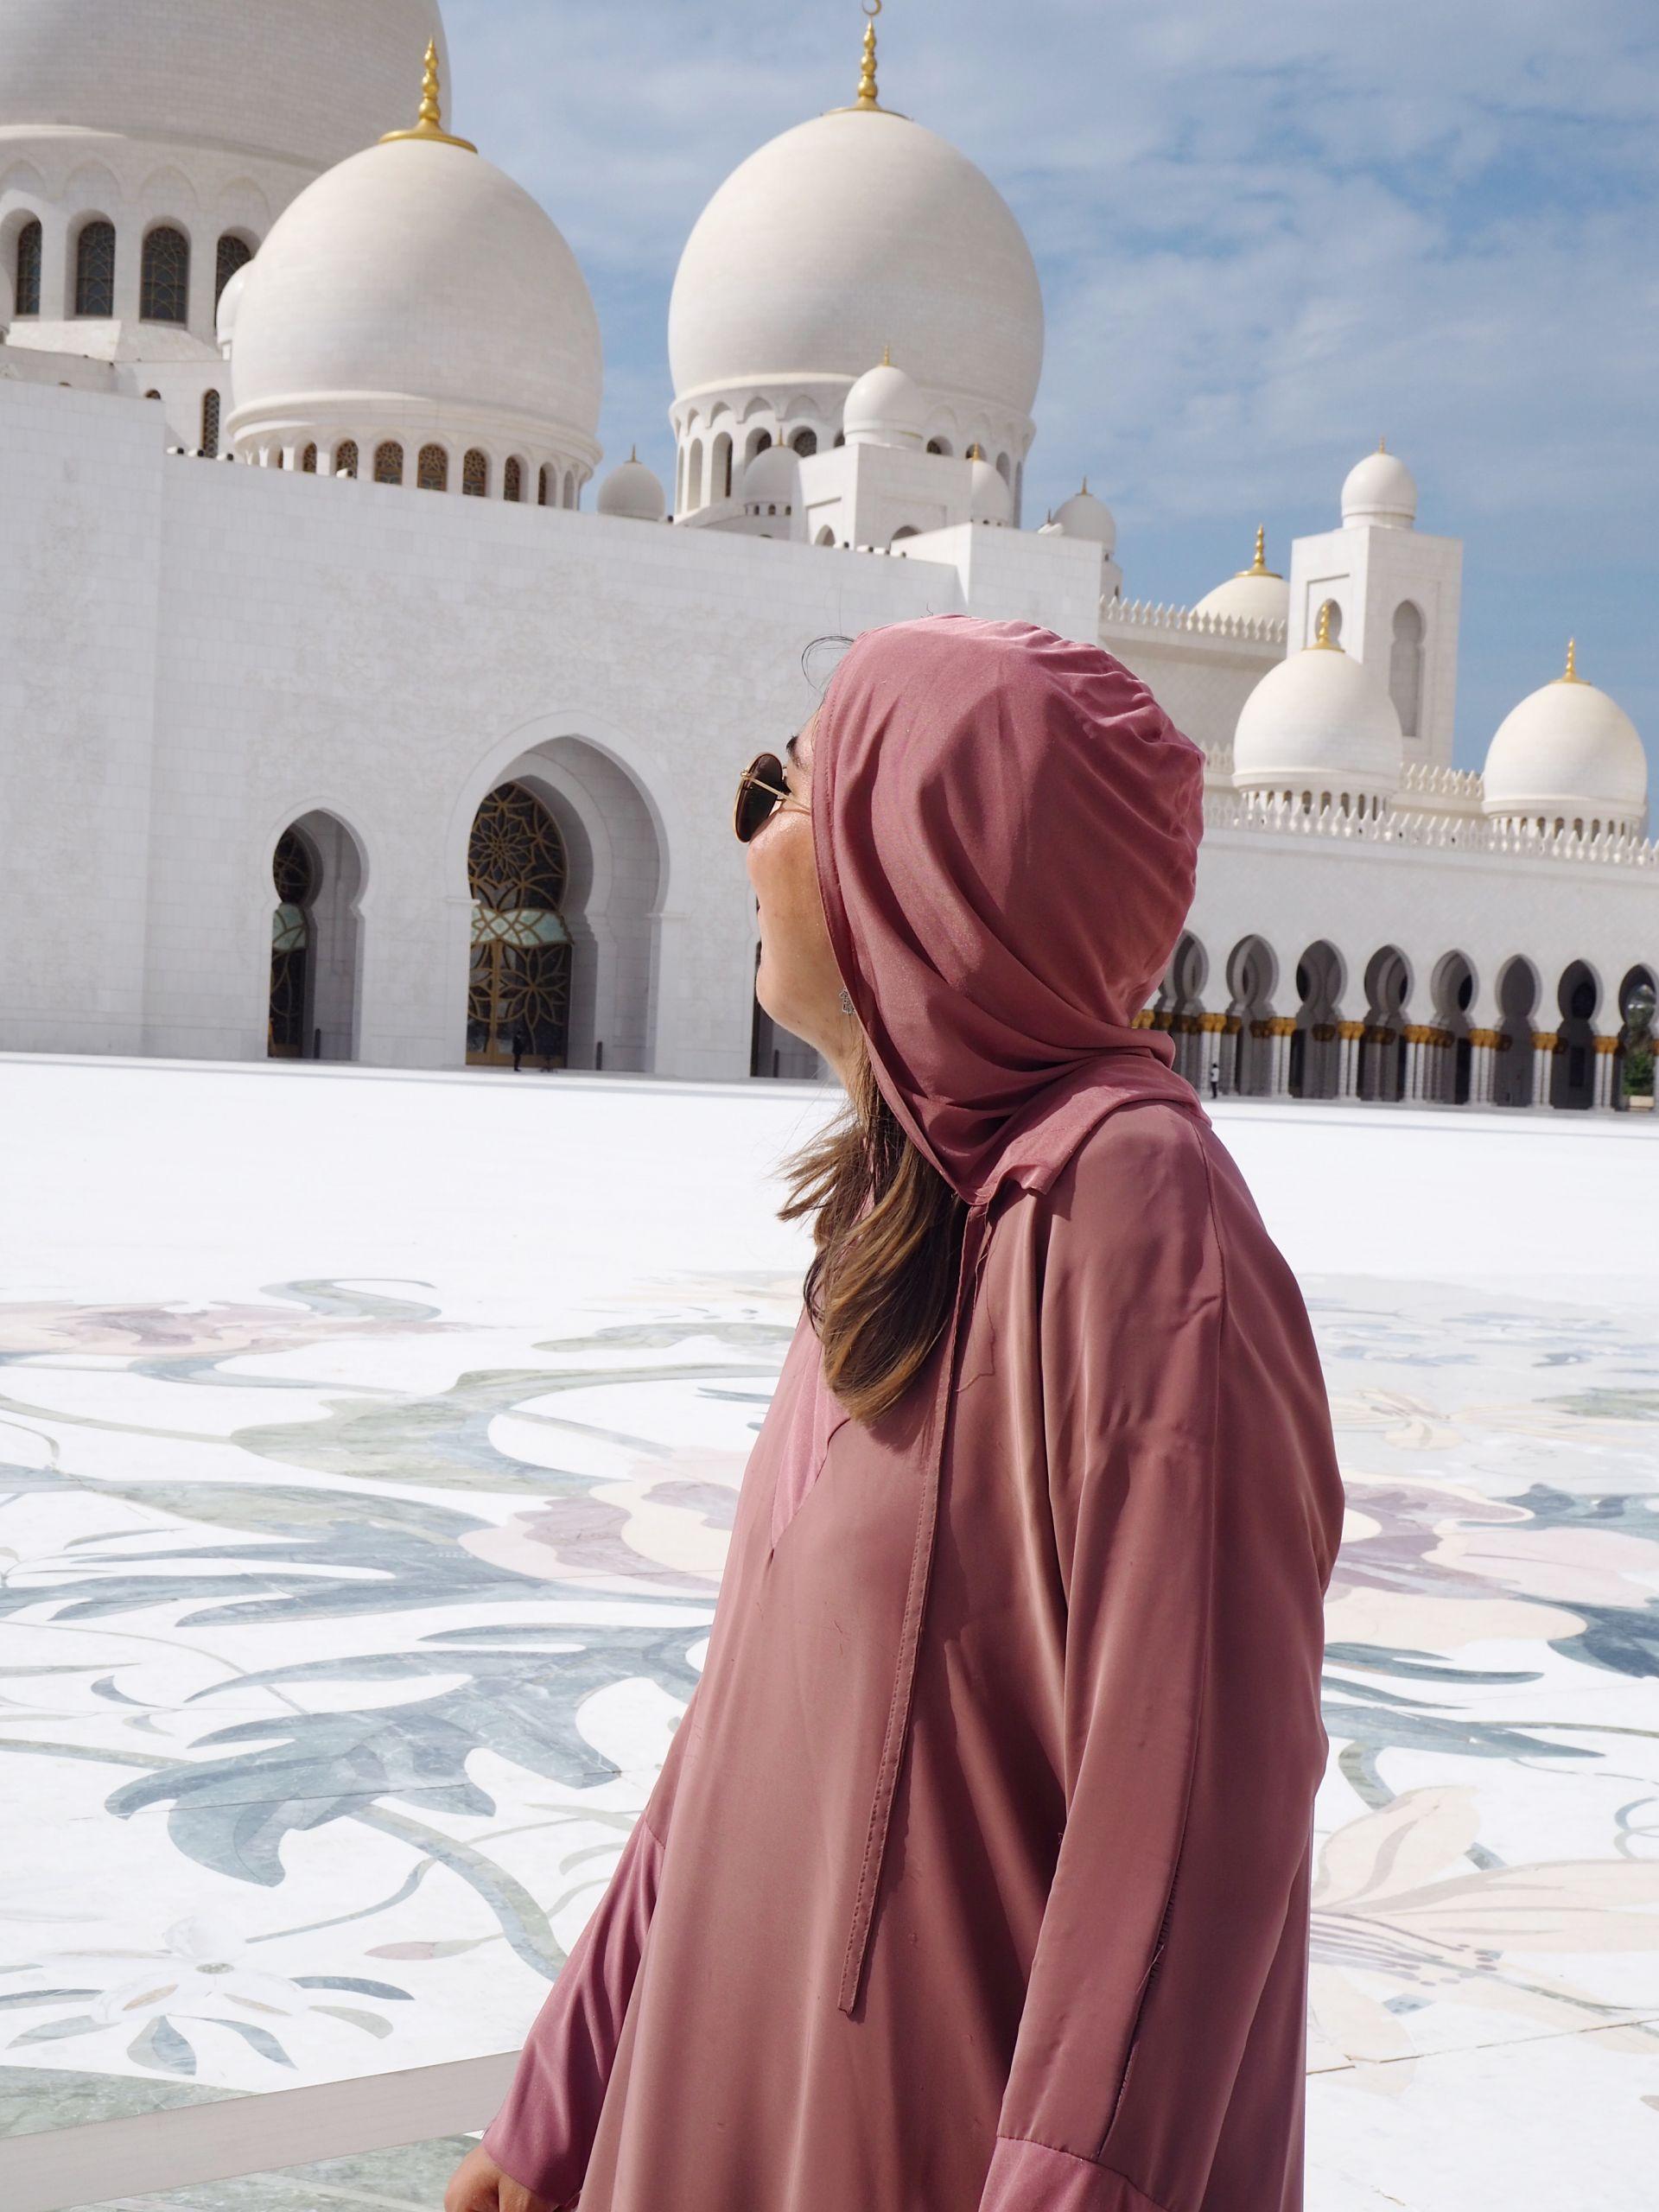 Exploring the Emirates: Sheikh Zayed Grand Mosque, Abu Dhabi